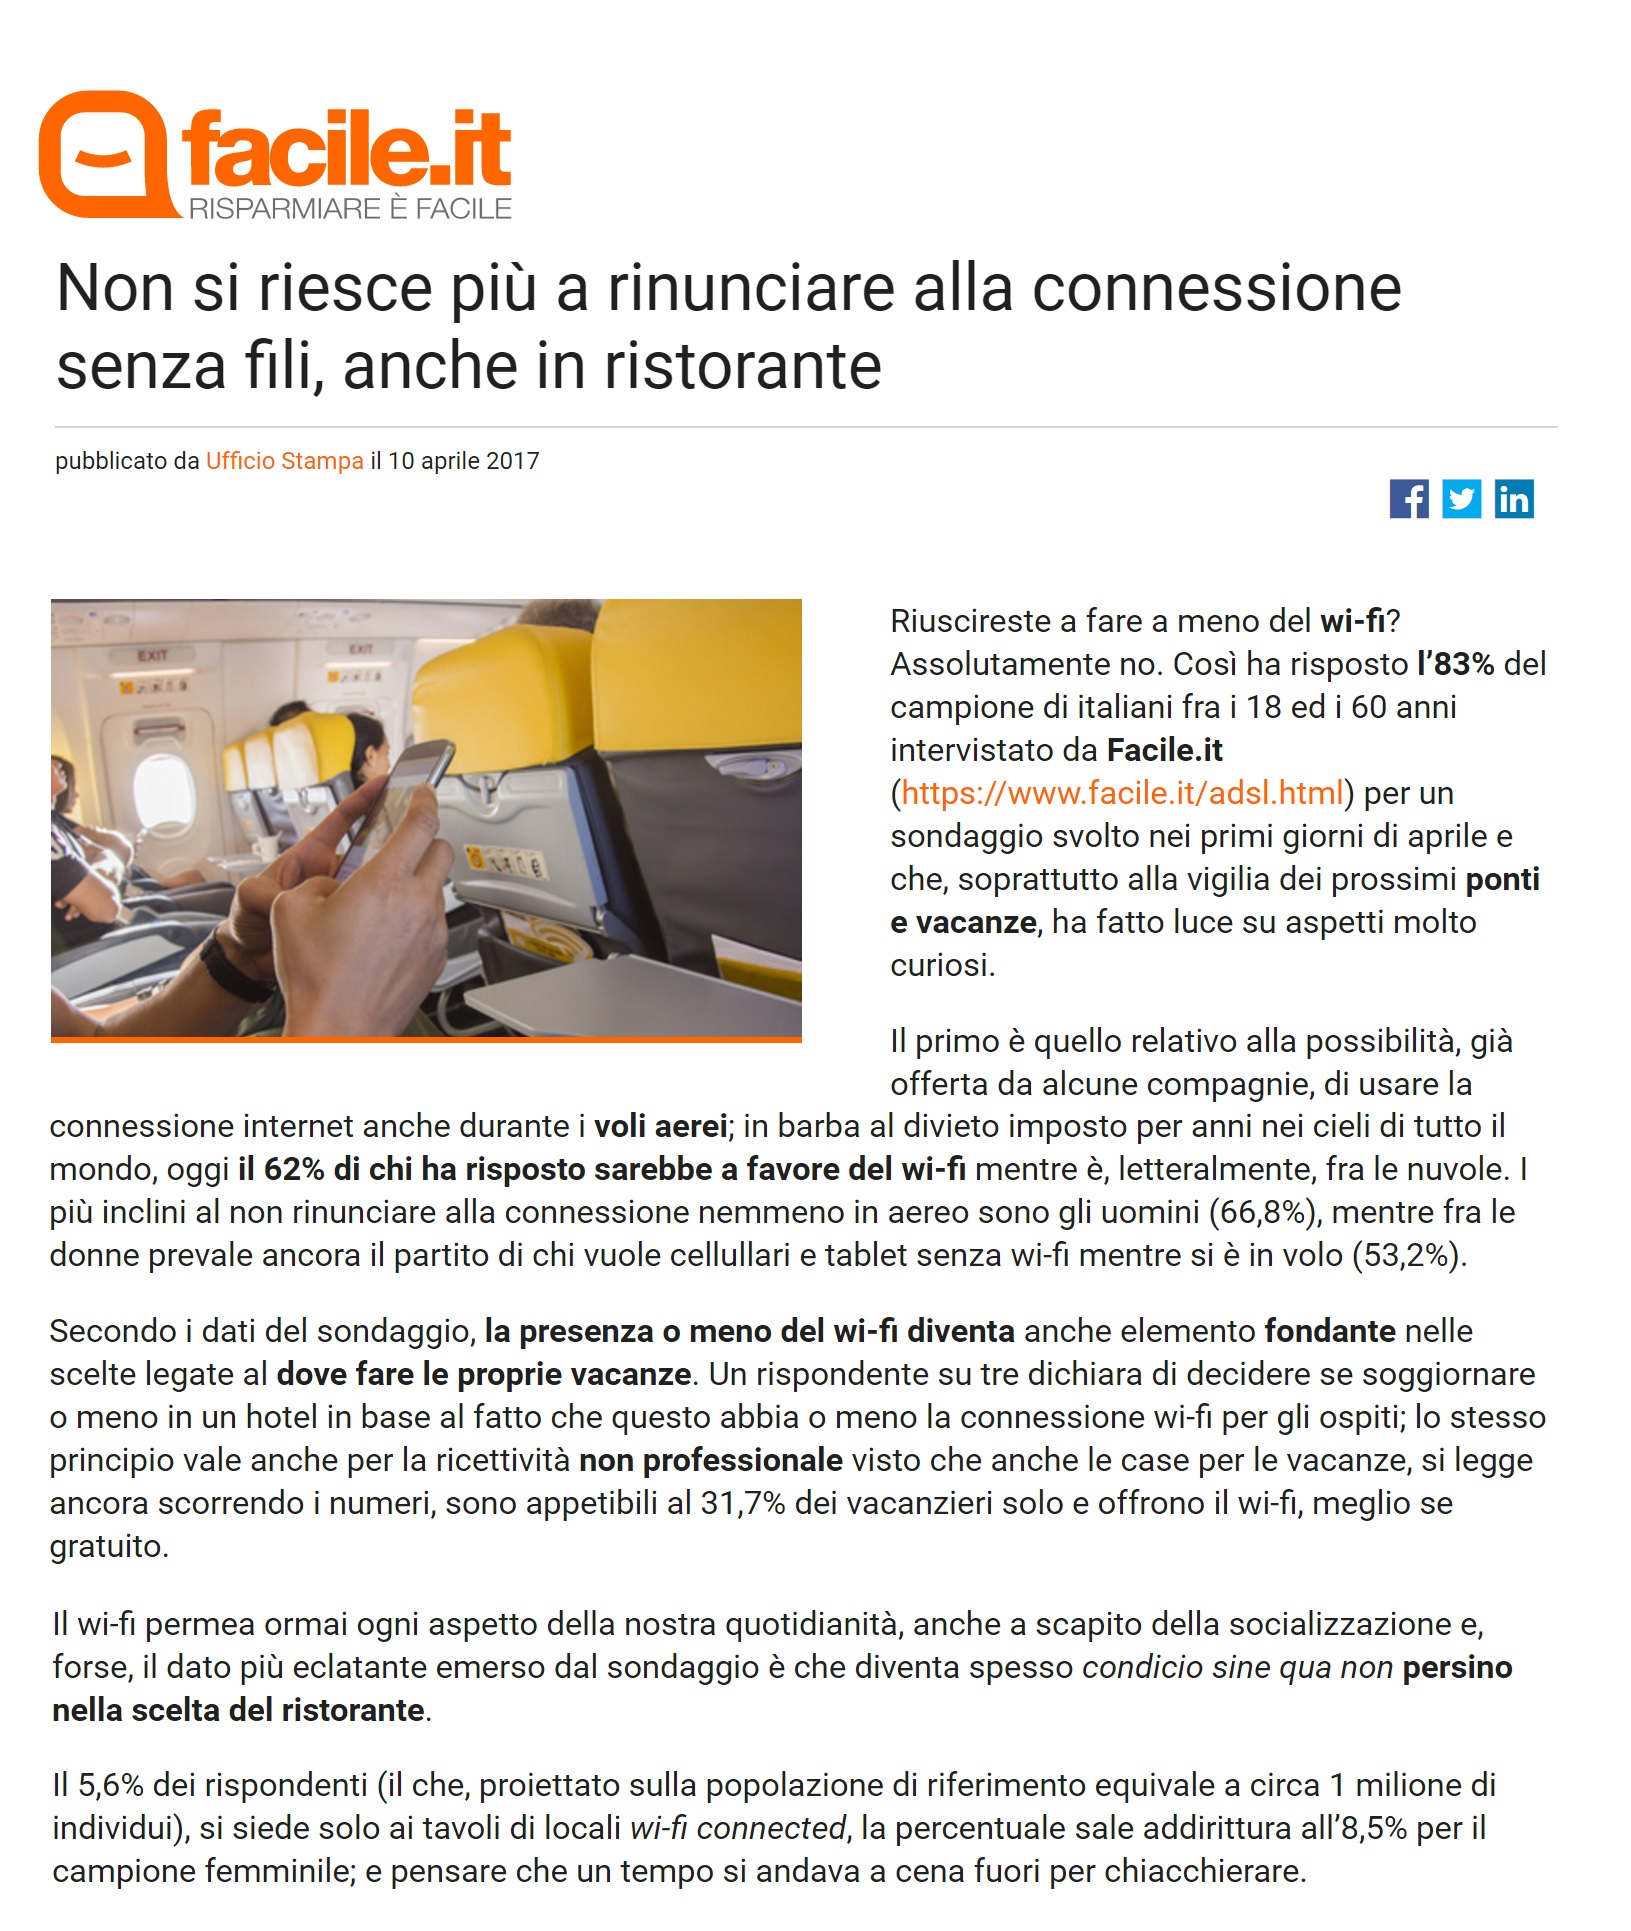 Sondaggio Facile.it